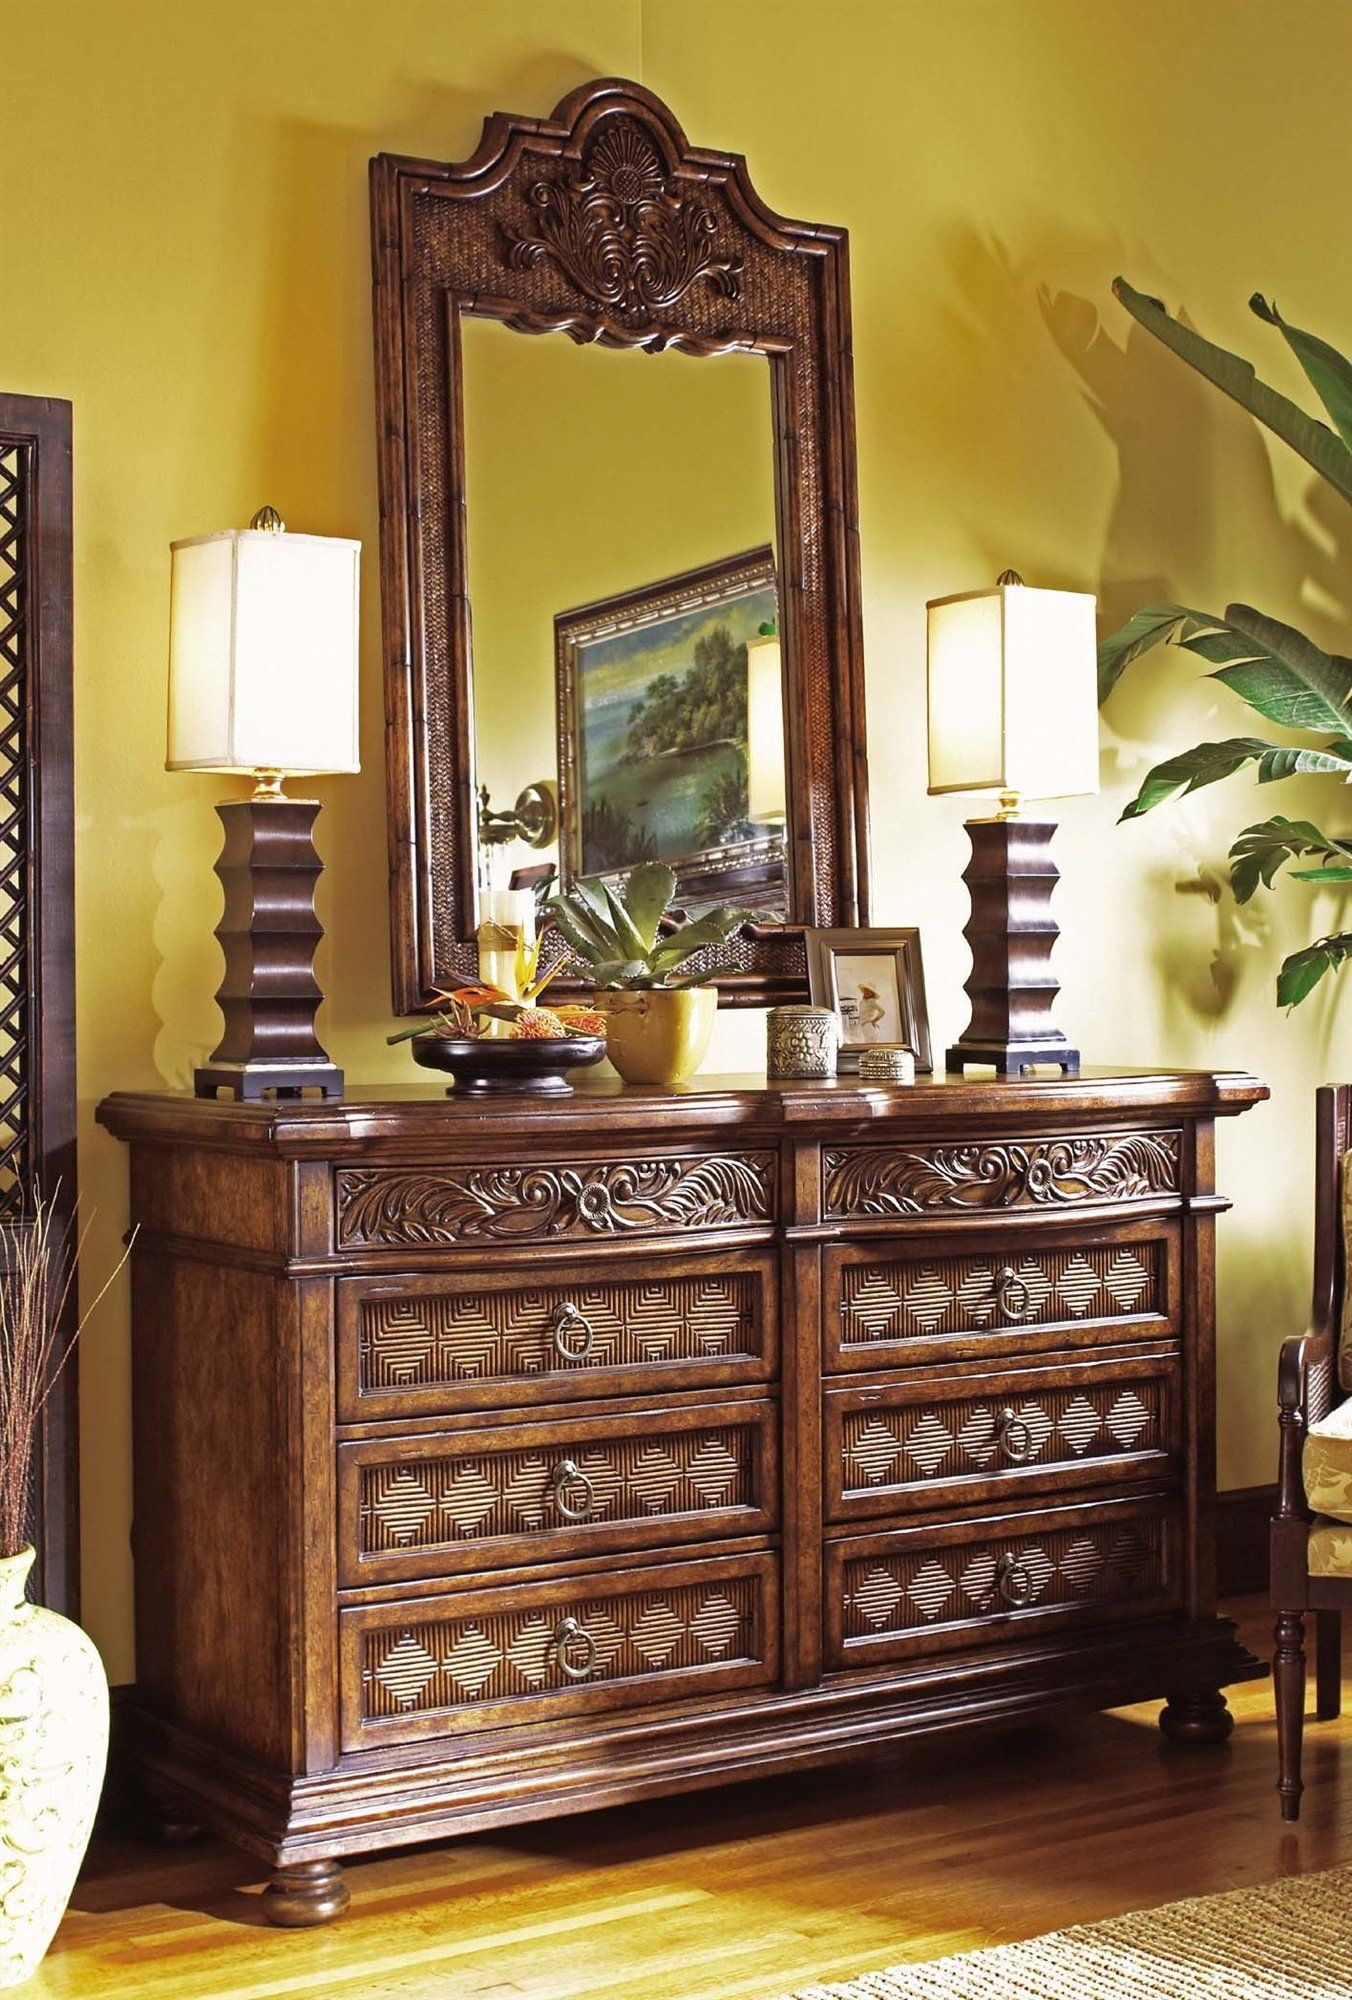 tommy bahama bedroom furniture | Cheap Tommy Bahama Jimbaran Bay ...